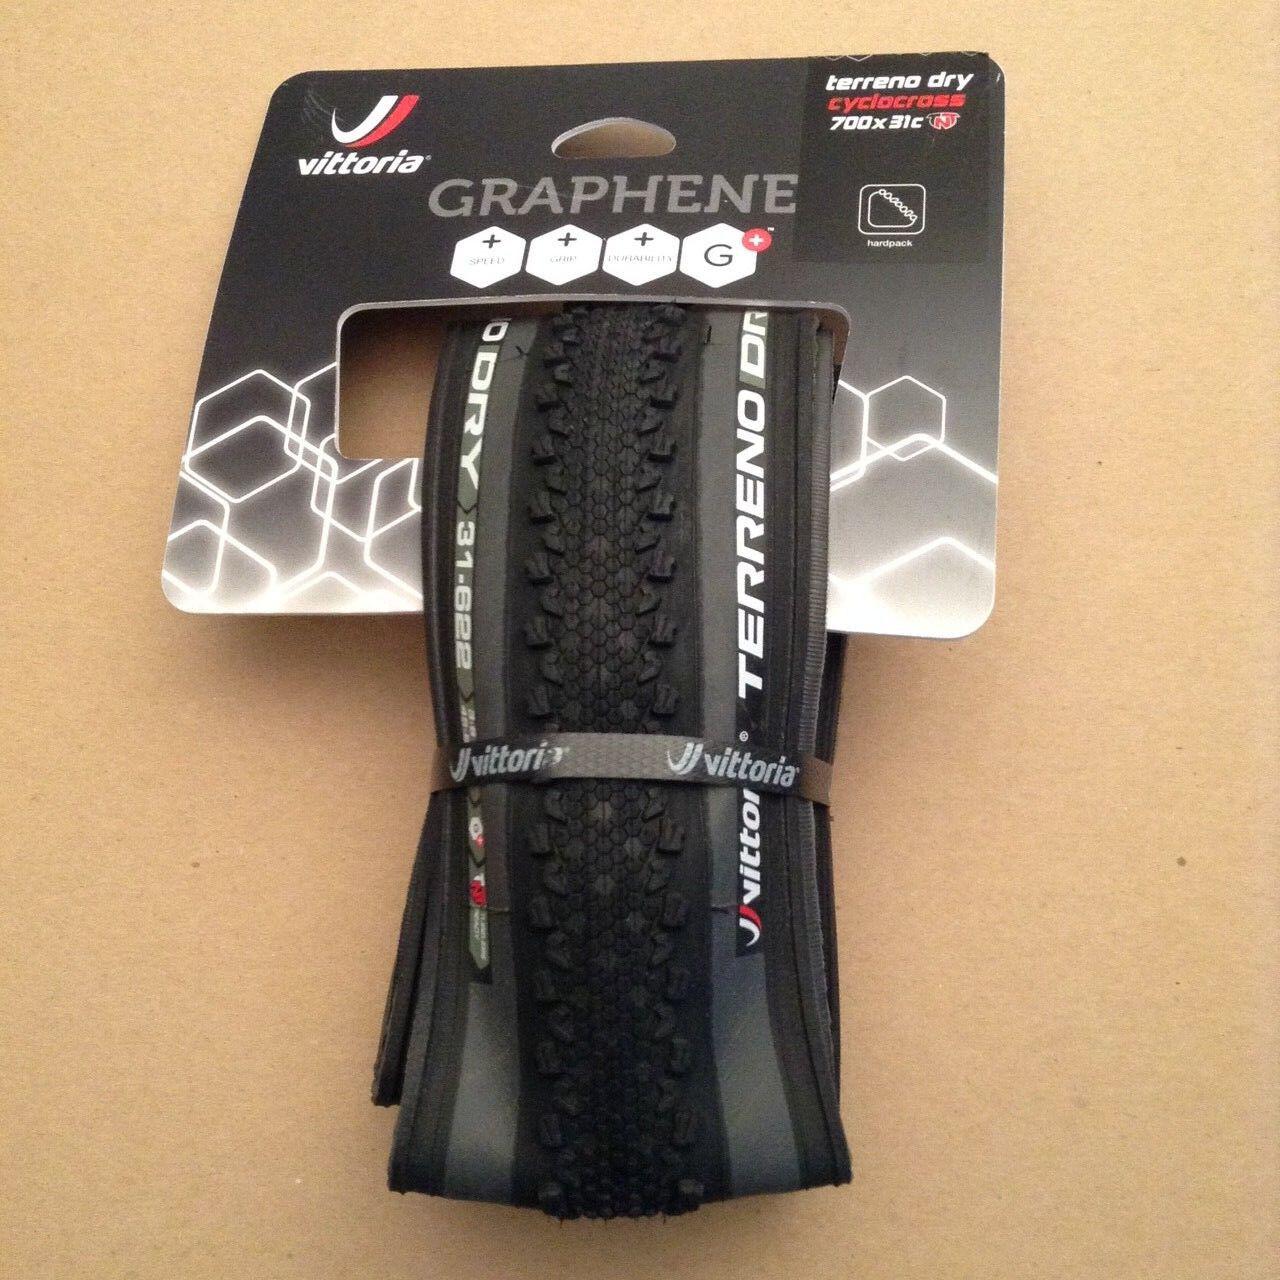 Vittoria Terreno Dry G Cyclocross Größel Reiten 31c 700c TNT Tubeless Tire